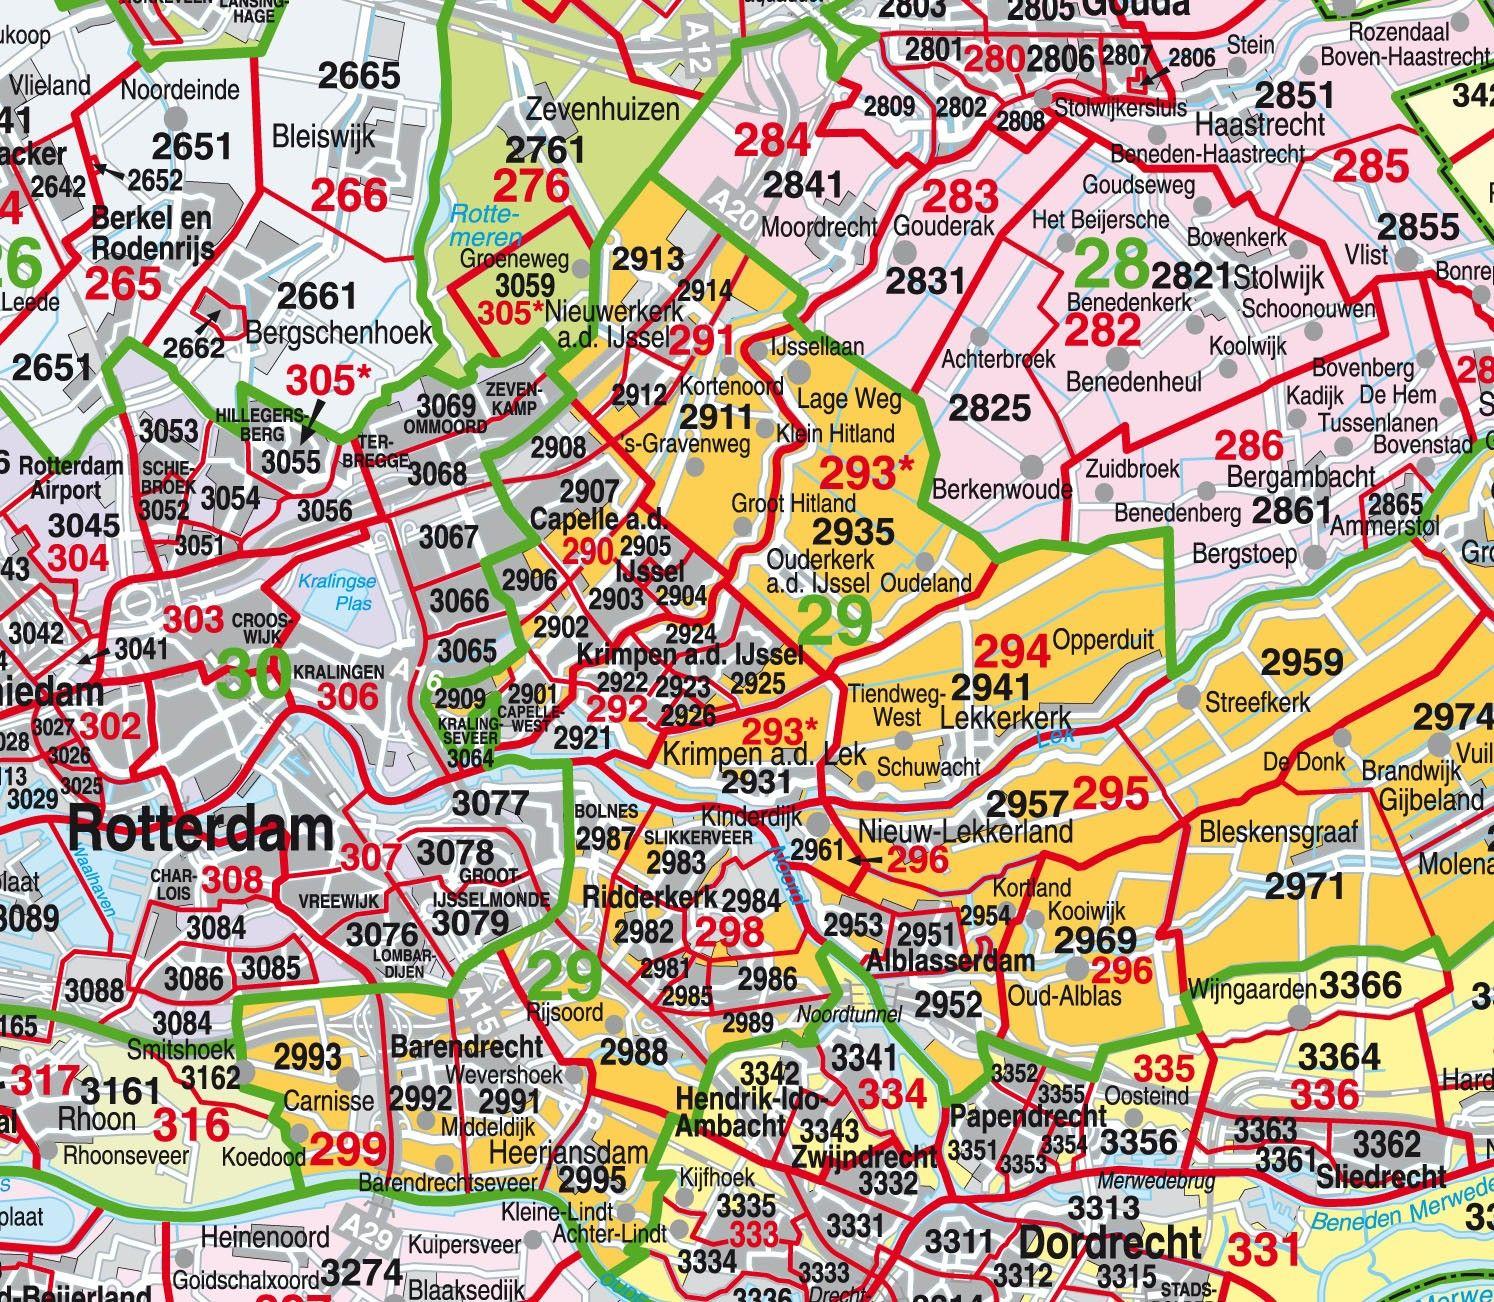 Digitale Postcodekaart Provincie Zuid Holland 1:100.000